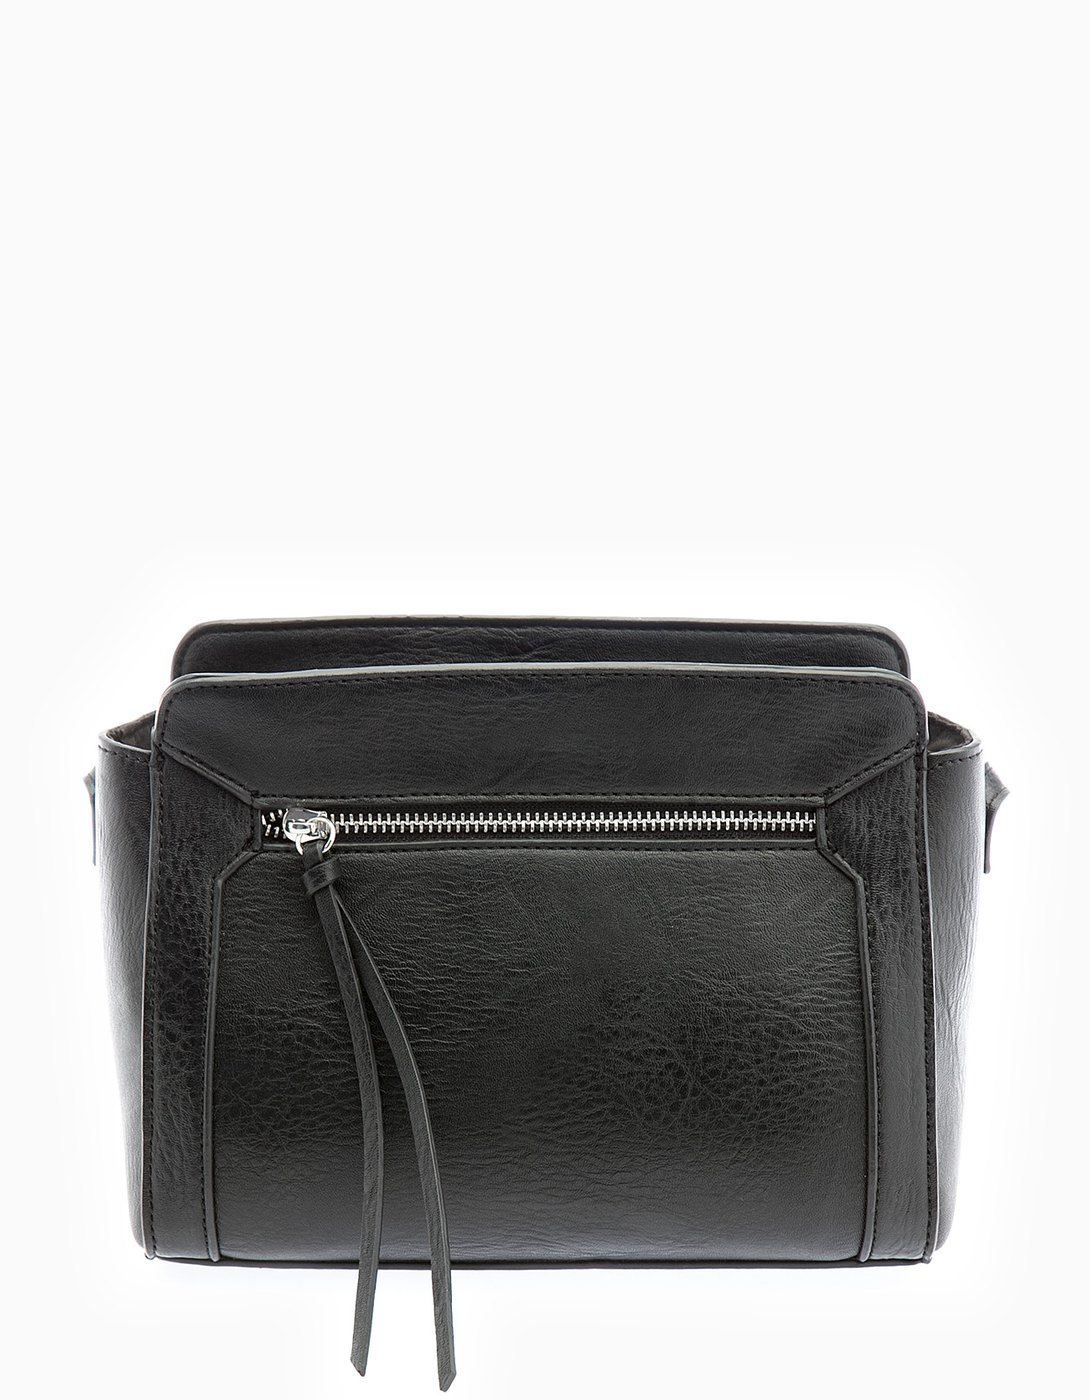 a3cf2a8e06d7 Micro satchel - Bags   Stradivarius Hungary   Lookbook in 2019 ...